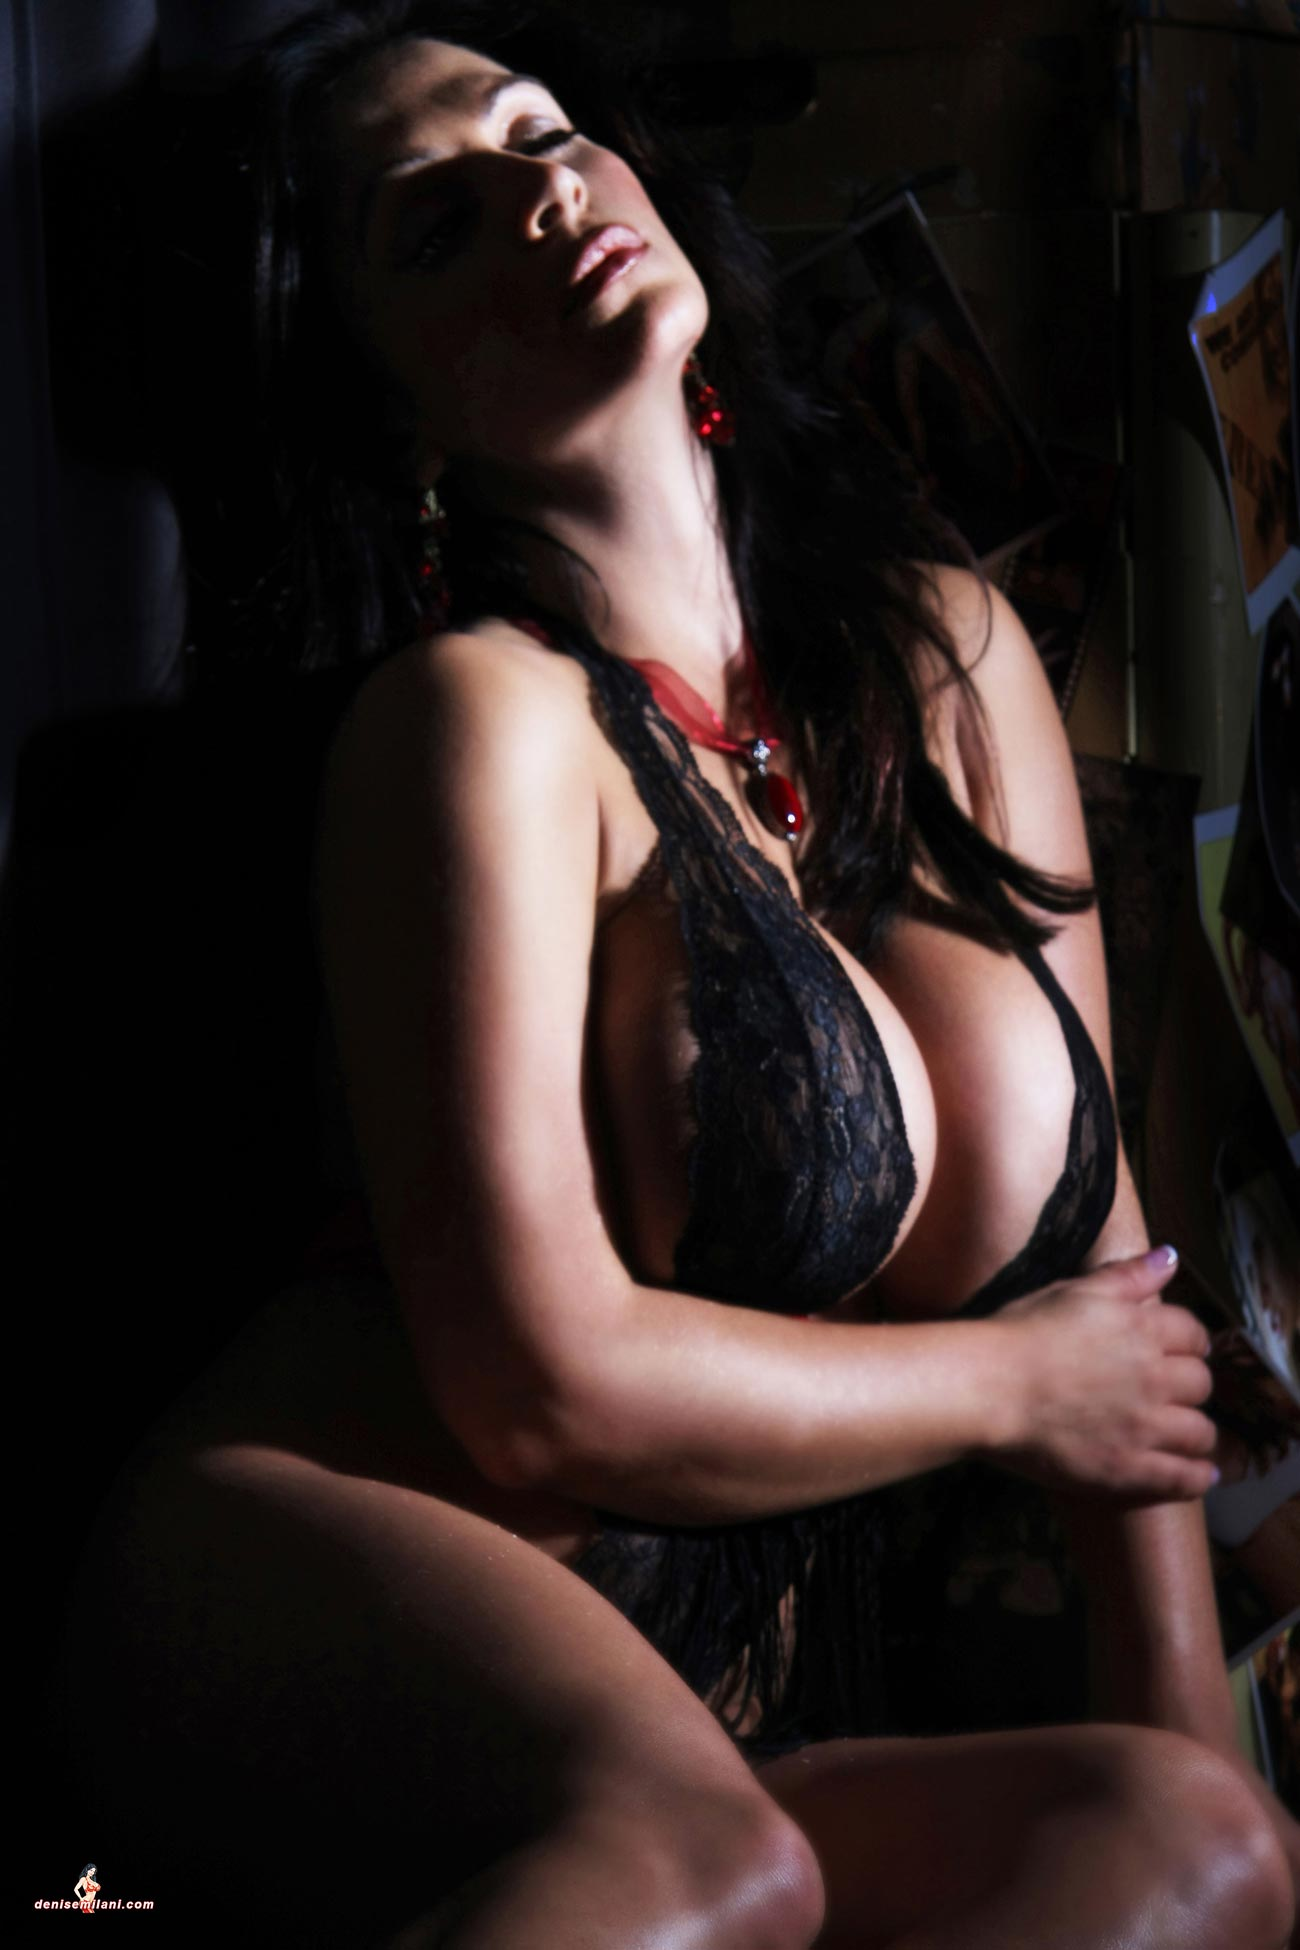 Busty Denise Milani in ultra short black underwear 03 ... Nude Aayla Secura Porno